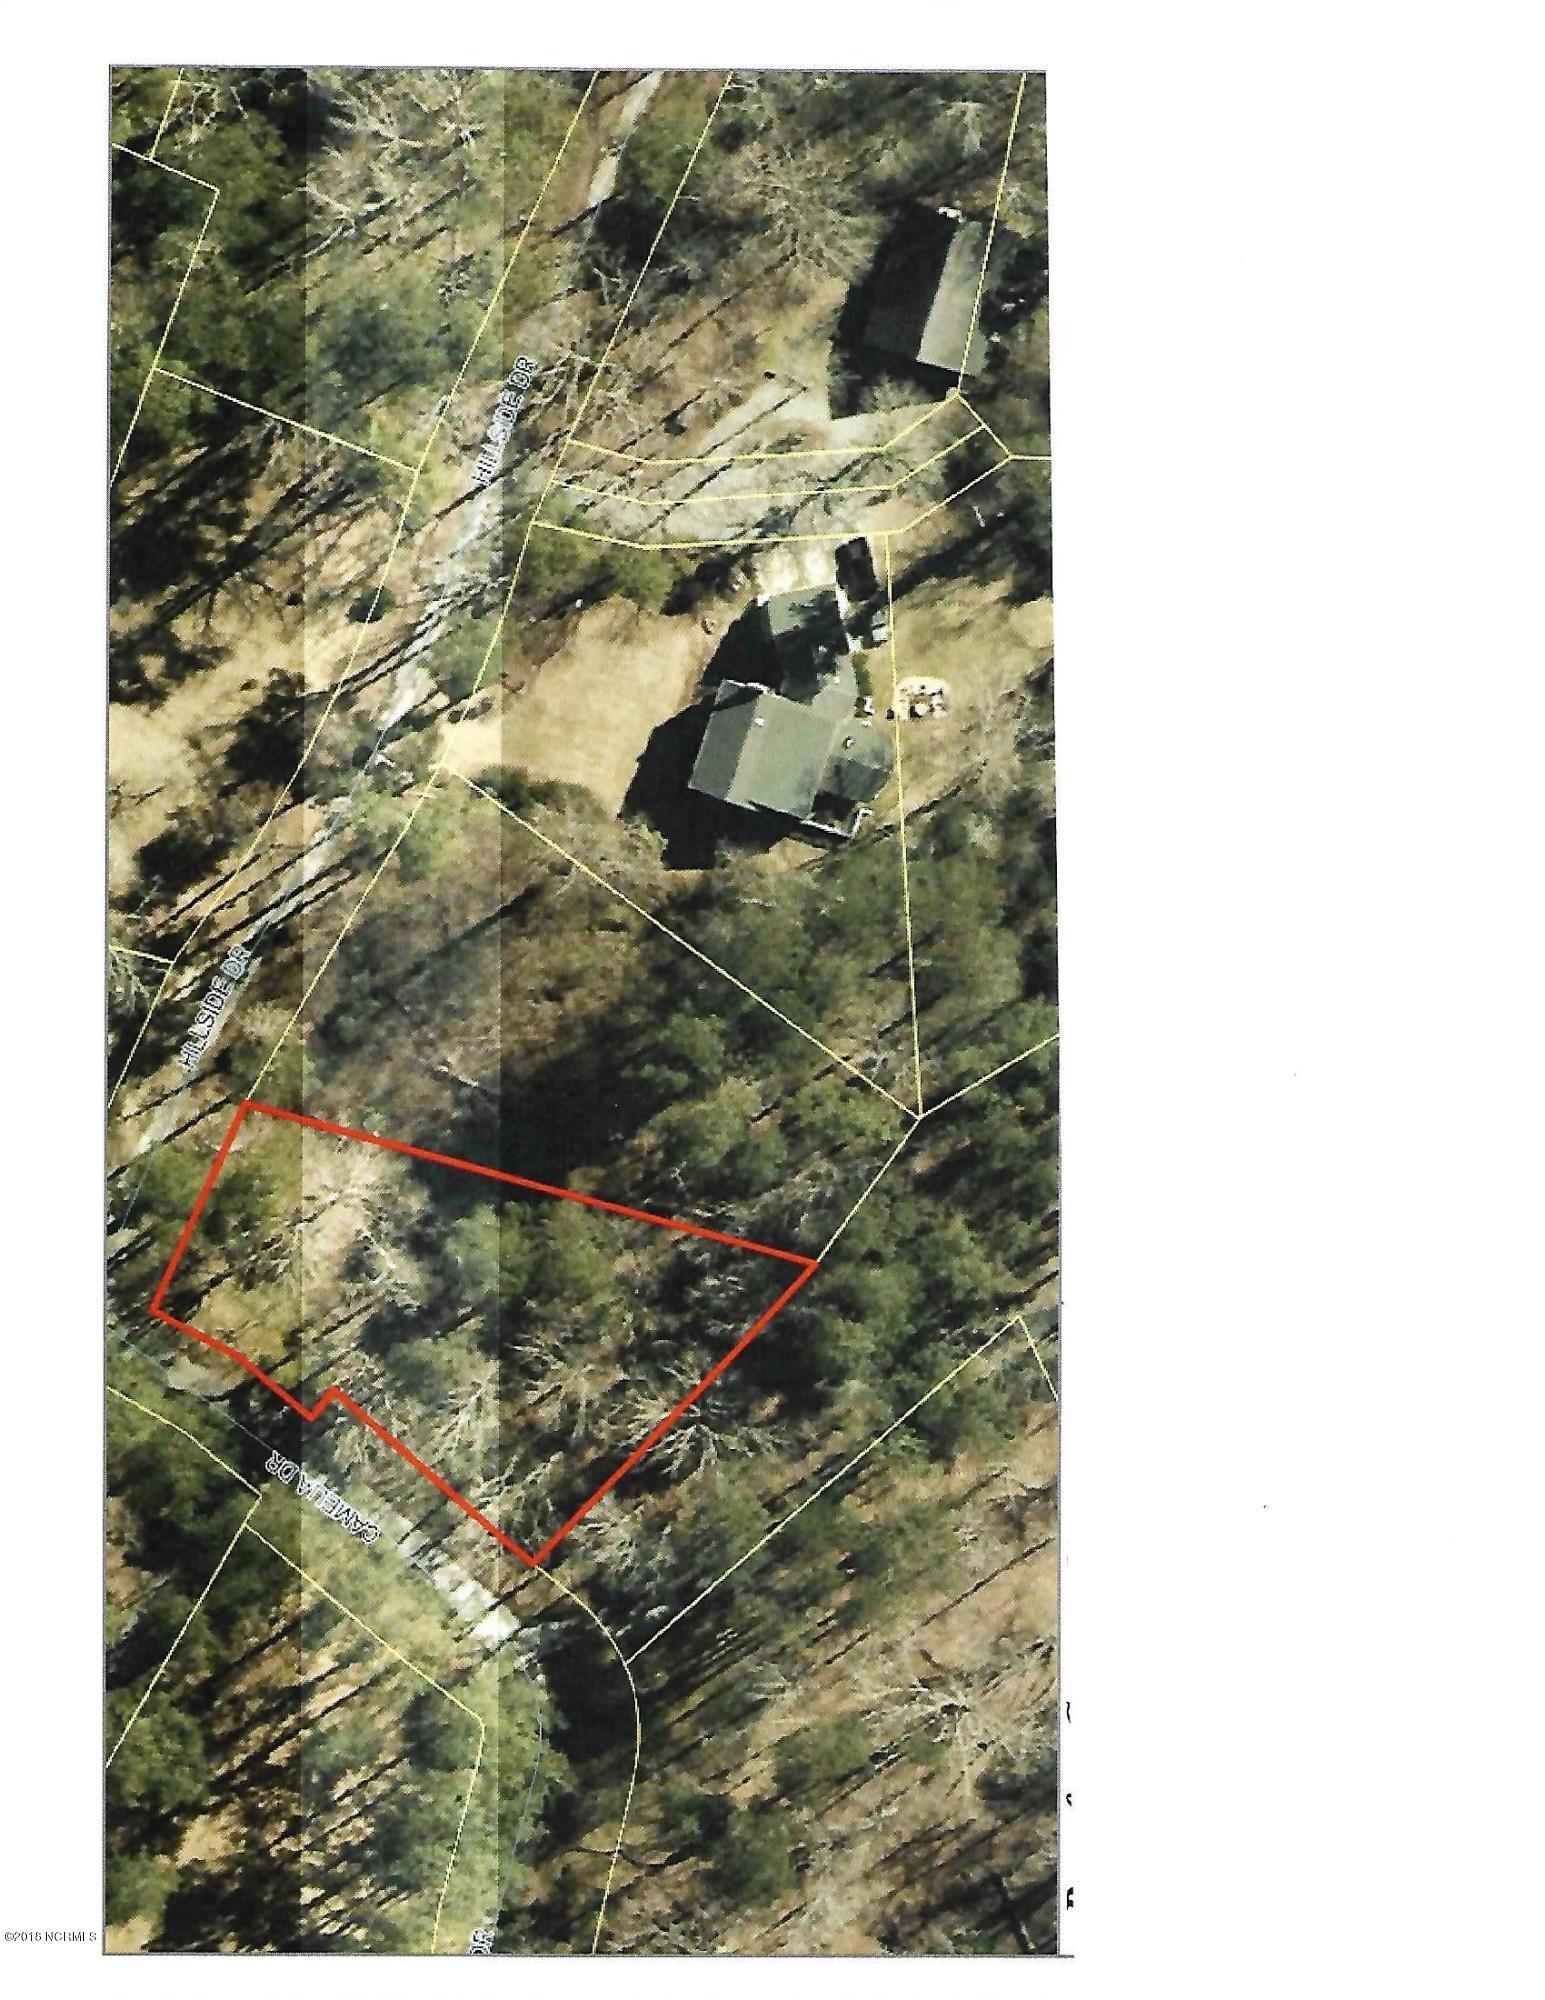 402 Hillside Drive, Washington, North Carolina 27889, ,Residential land,For sale,Hillside,100128266